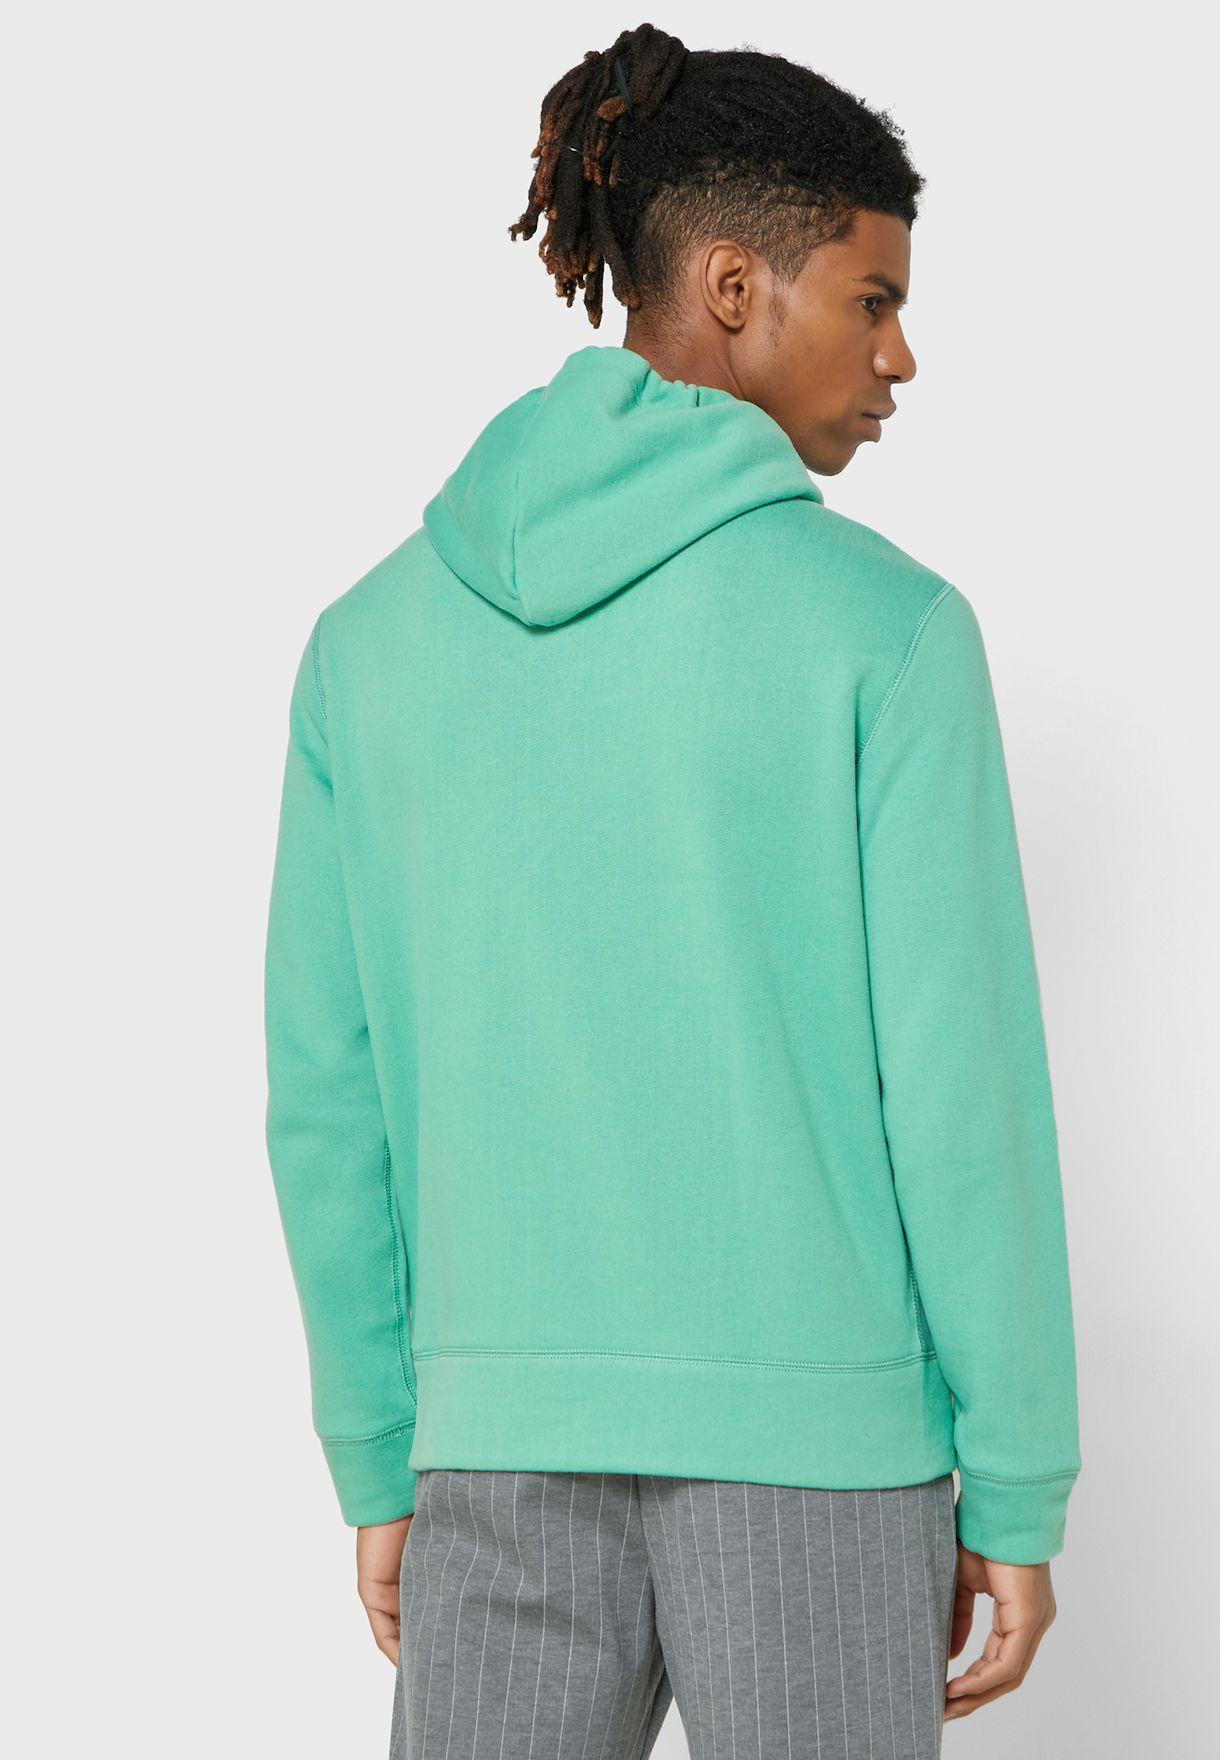 Ralph Lauren Polo Sweater Mens Size Large Beige Quarter